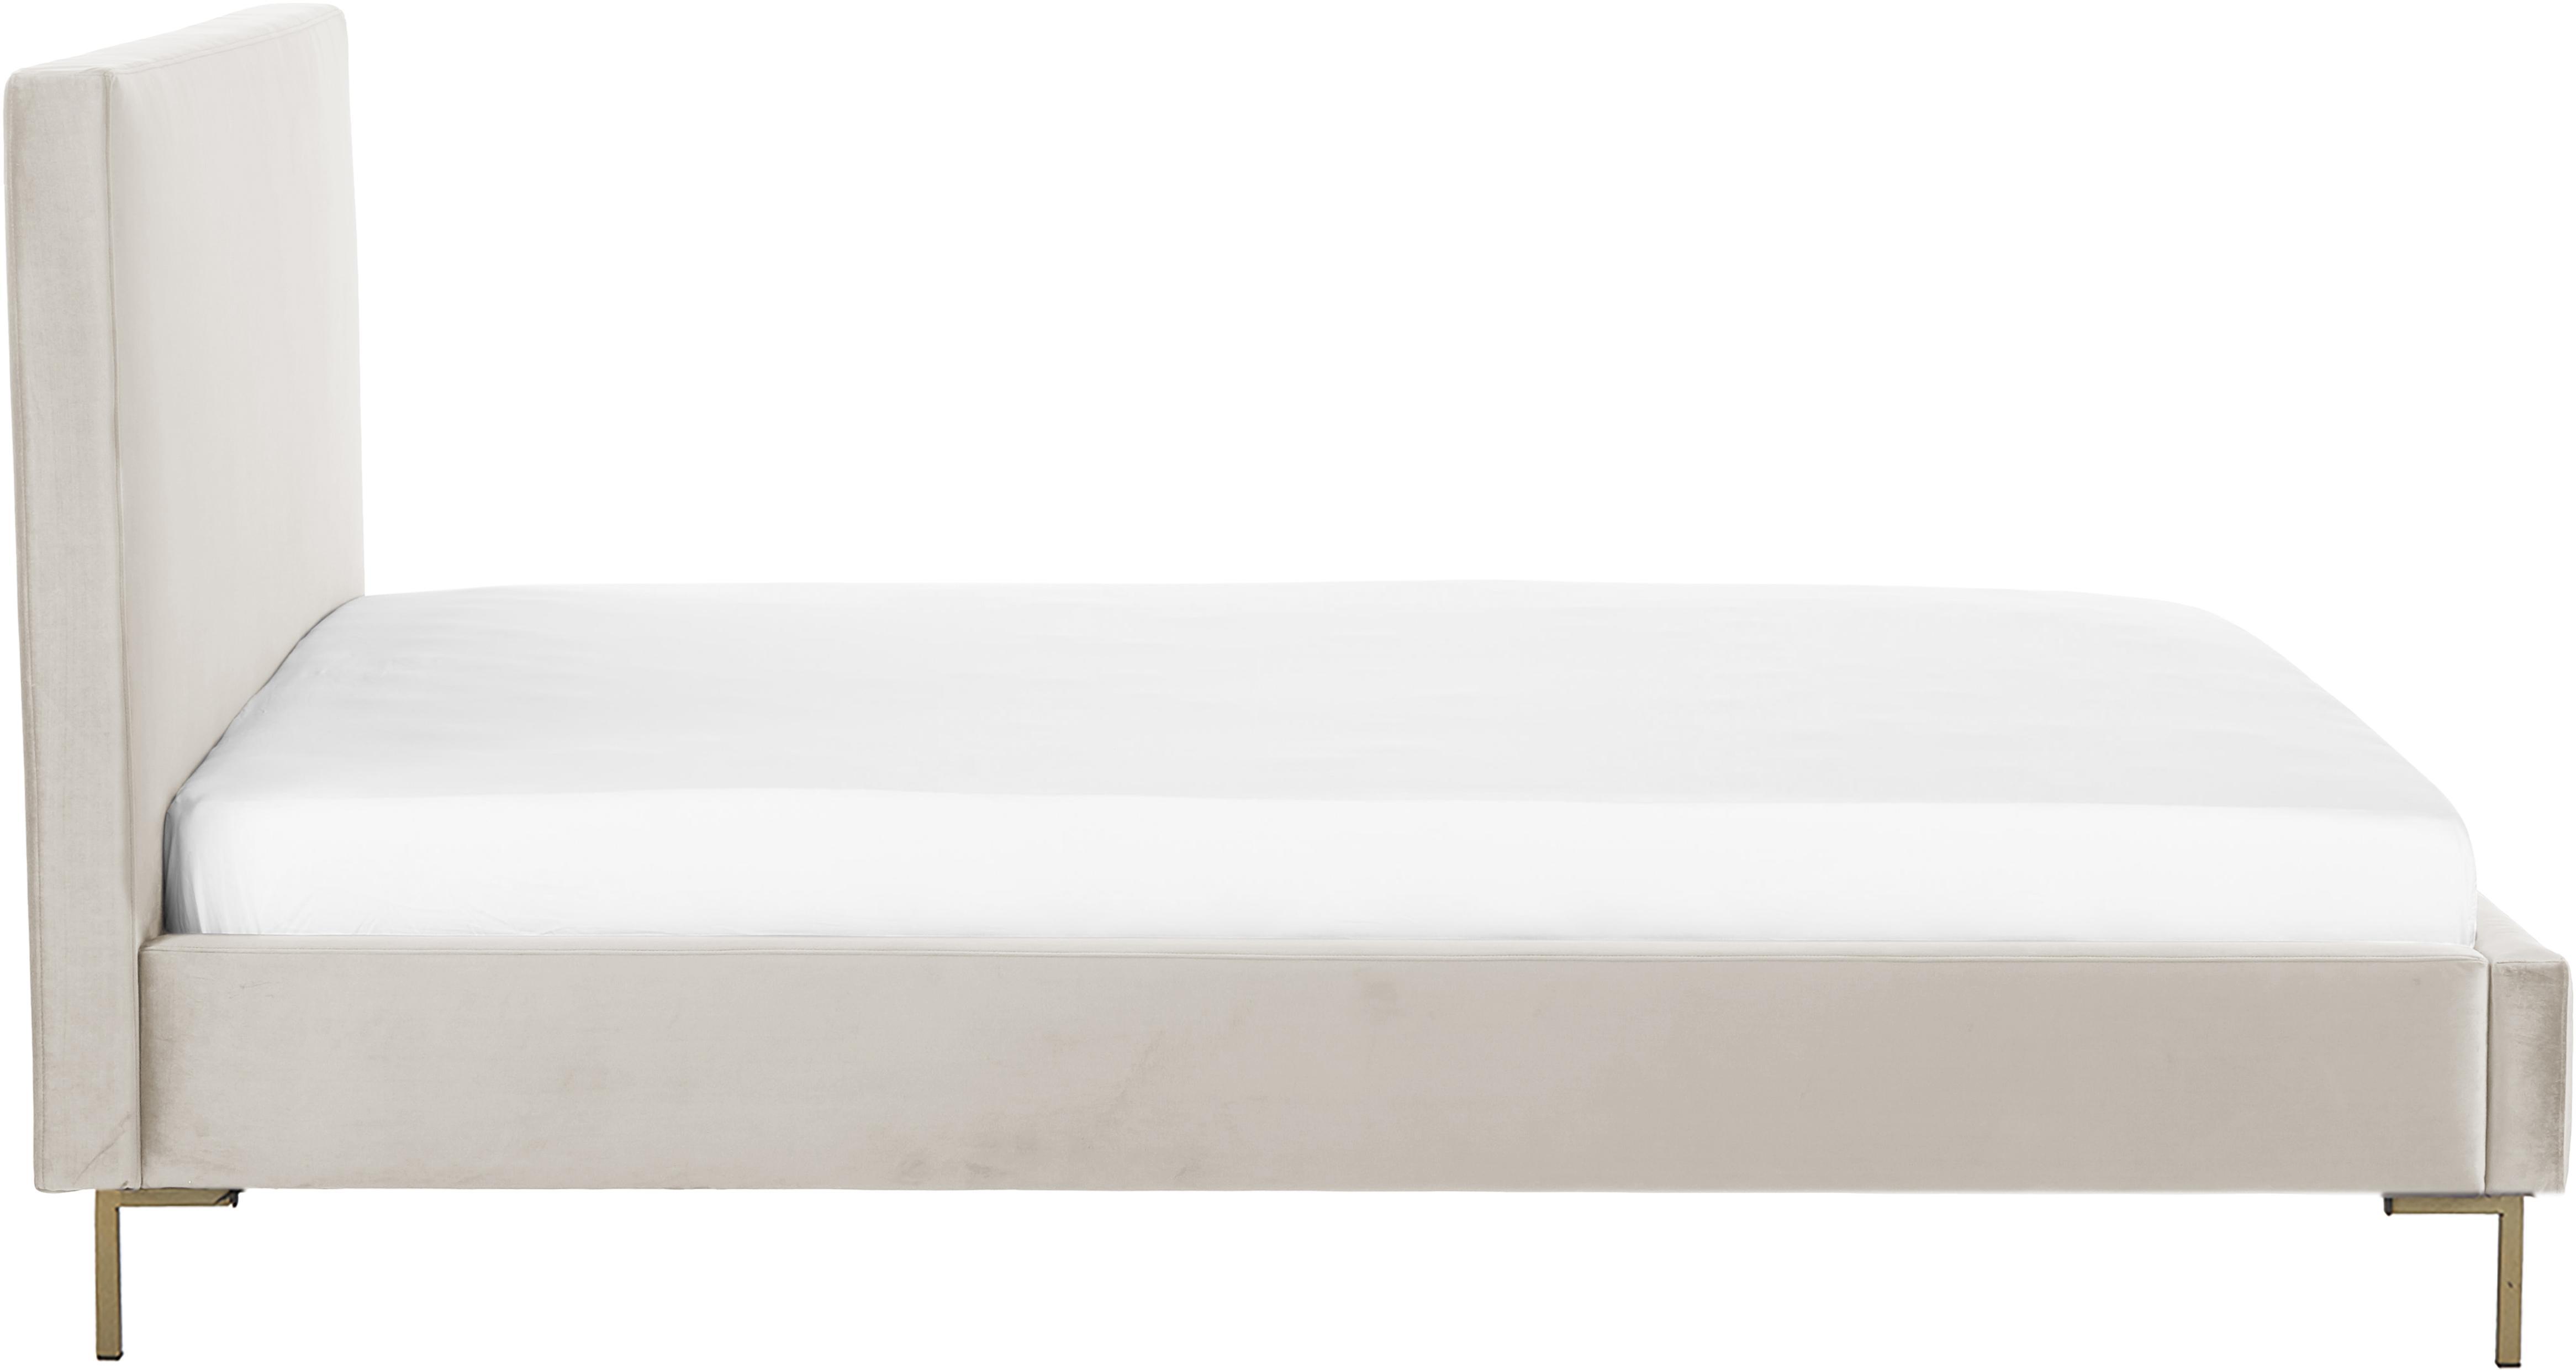 Samt-Polsterbett Peace, Korpus: Massives Kiefernholz, Füße: Metall, pulverbeschichtet, Bezug: Polyestersamt 30.000 Sche, Taupe, 180 x 200 cm